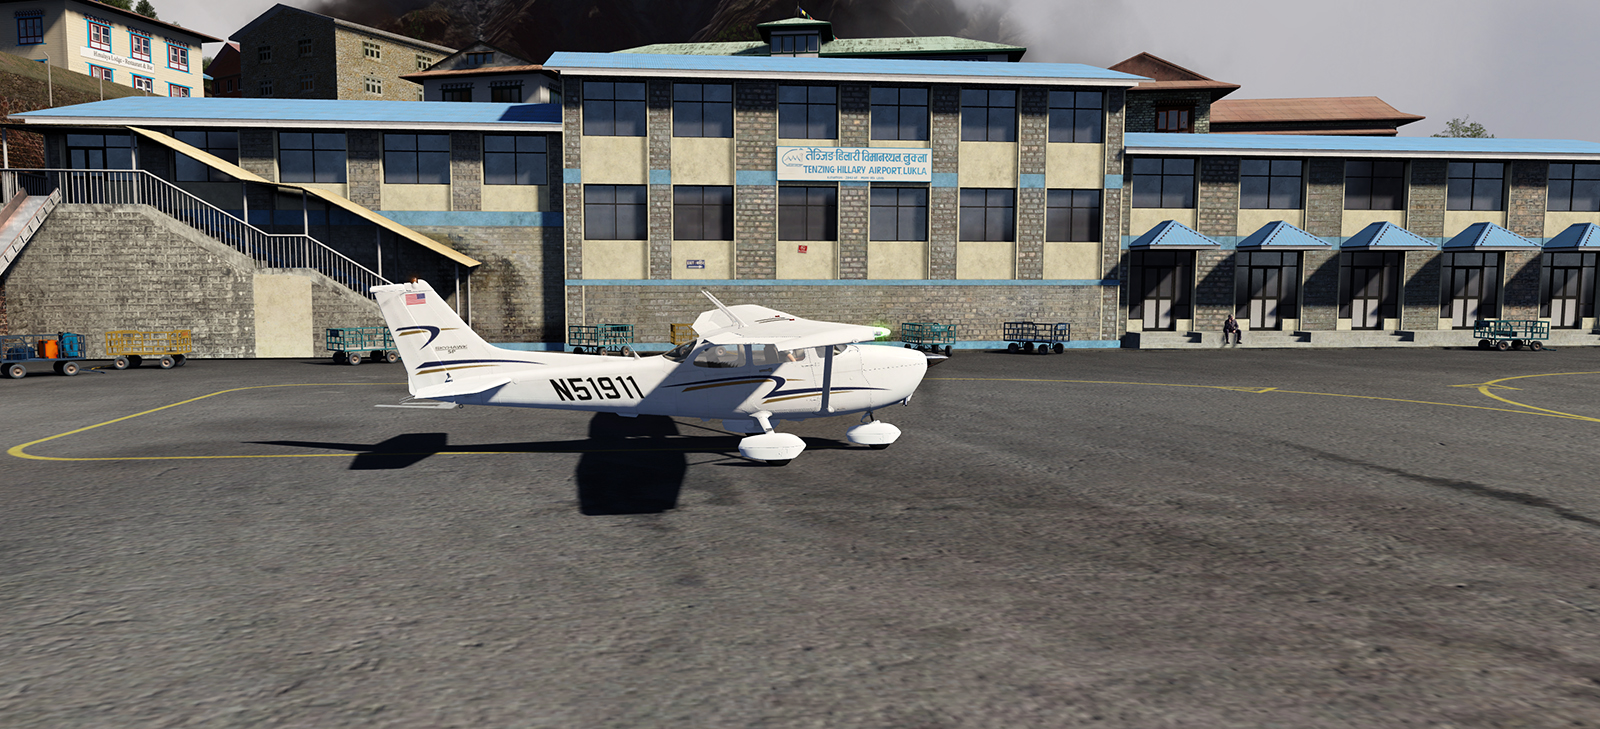 aerofly_fs_2_screenshot_11_20190614-0115